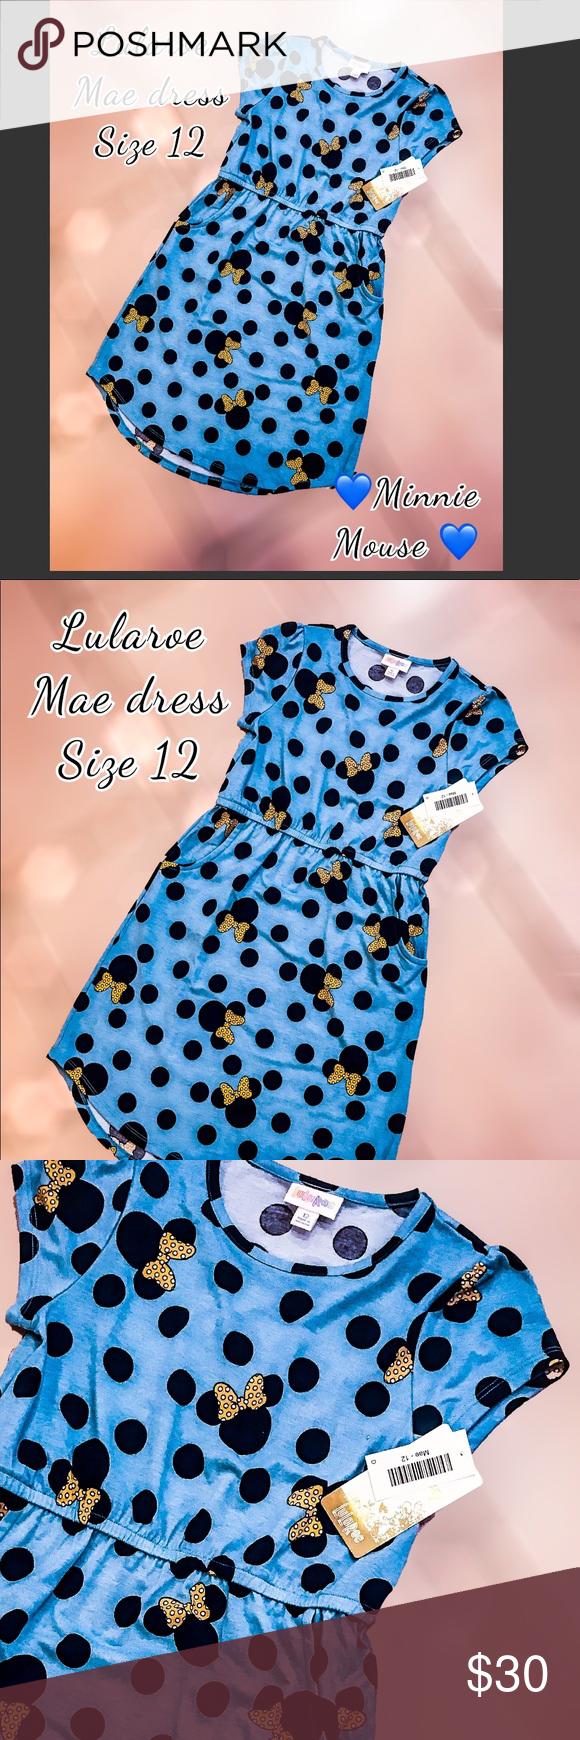 Stunning Minnie Mouse Party Dress Ideas - Wedding Ideas - memiocall.com